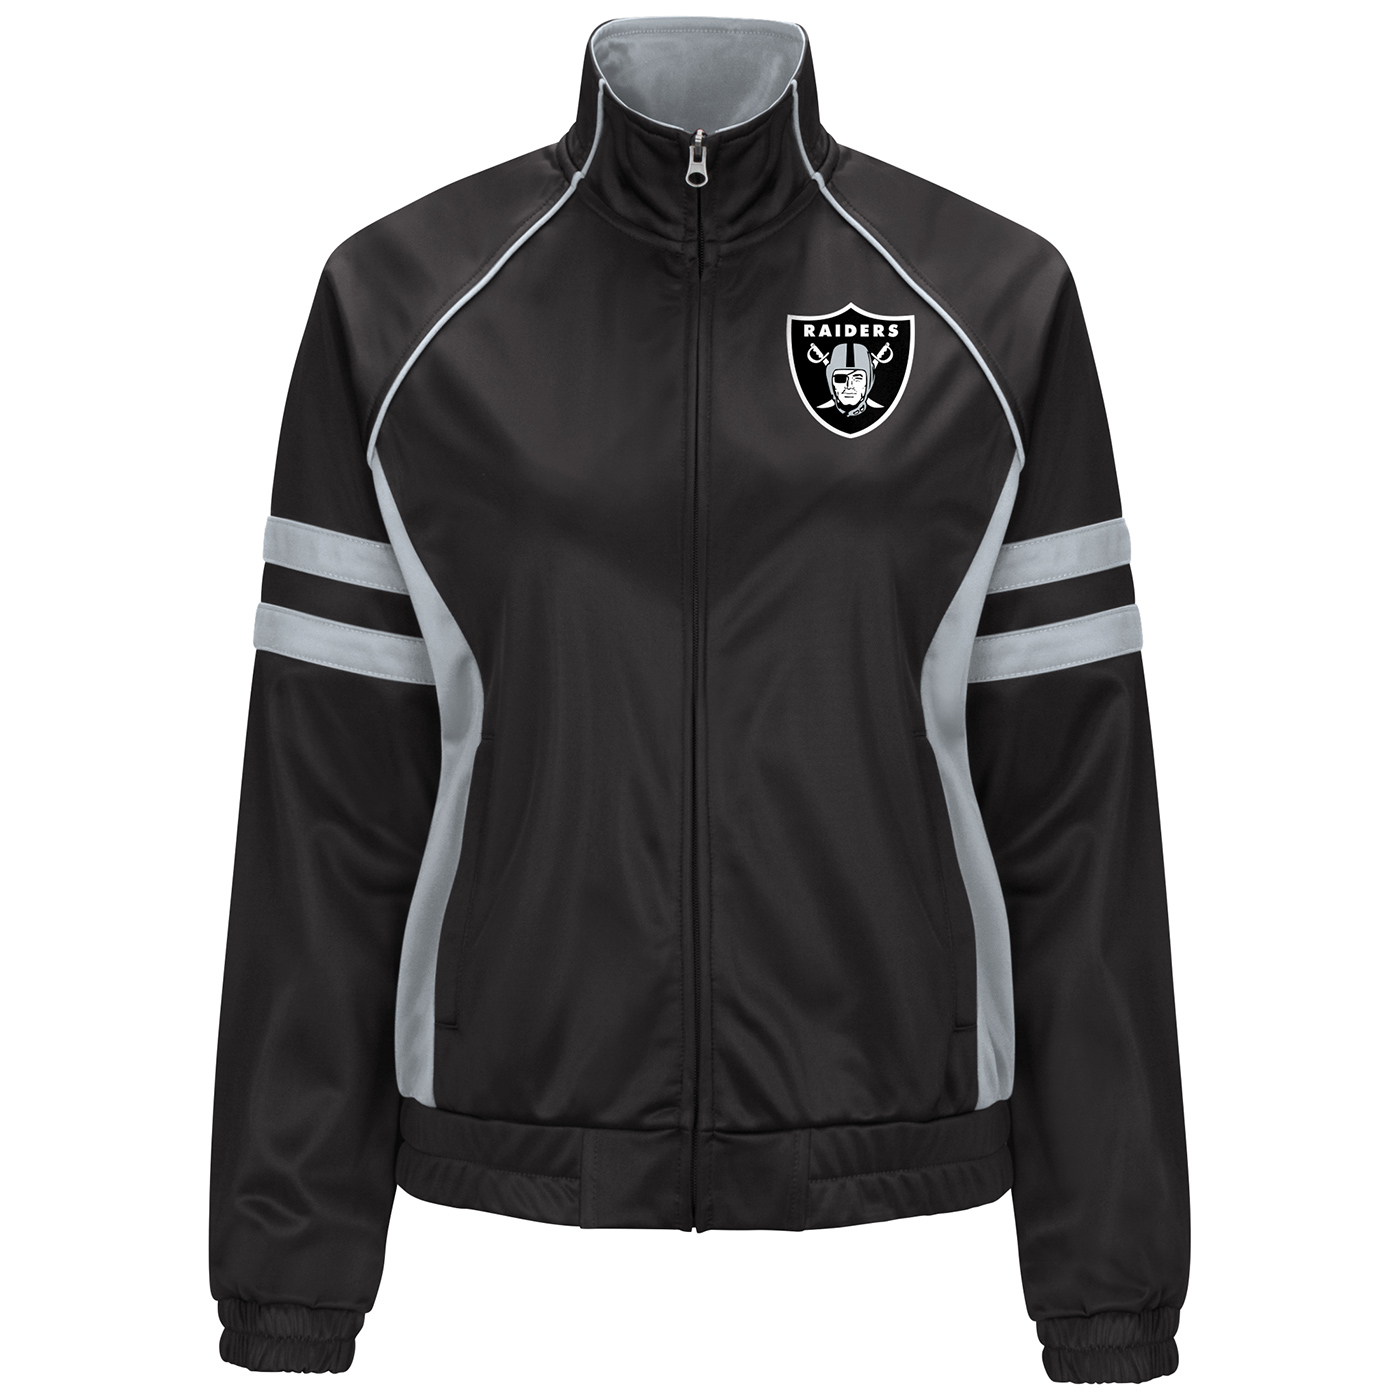 6d400511 Oakland Football Raiders Women's Legend Track Jacket